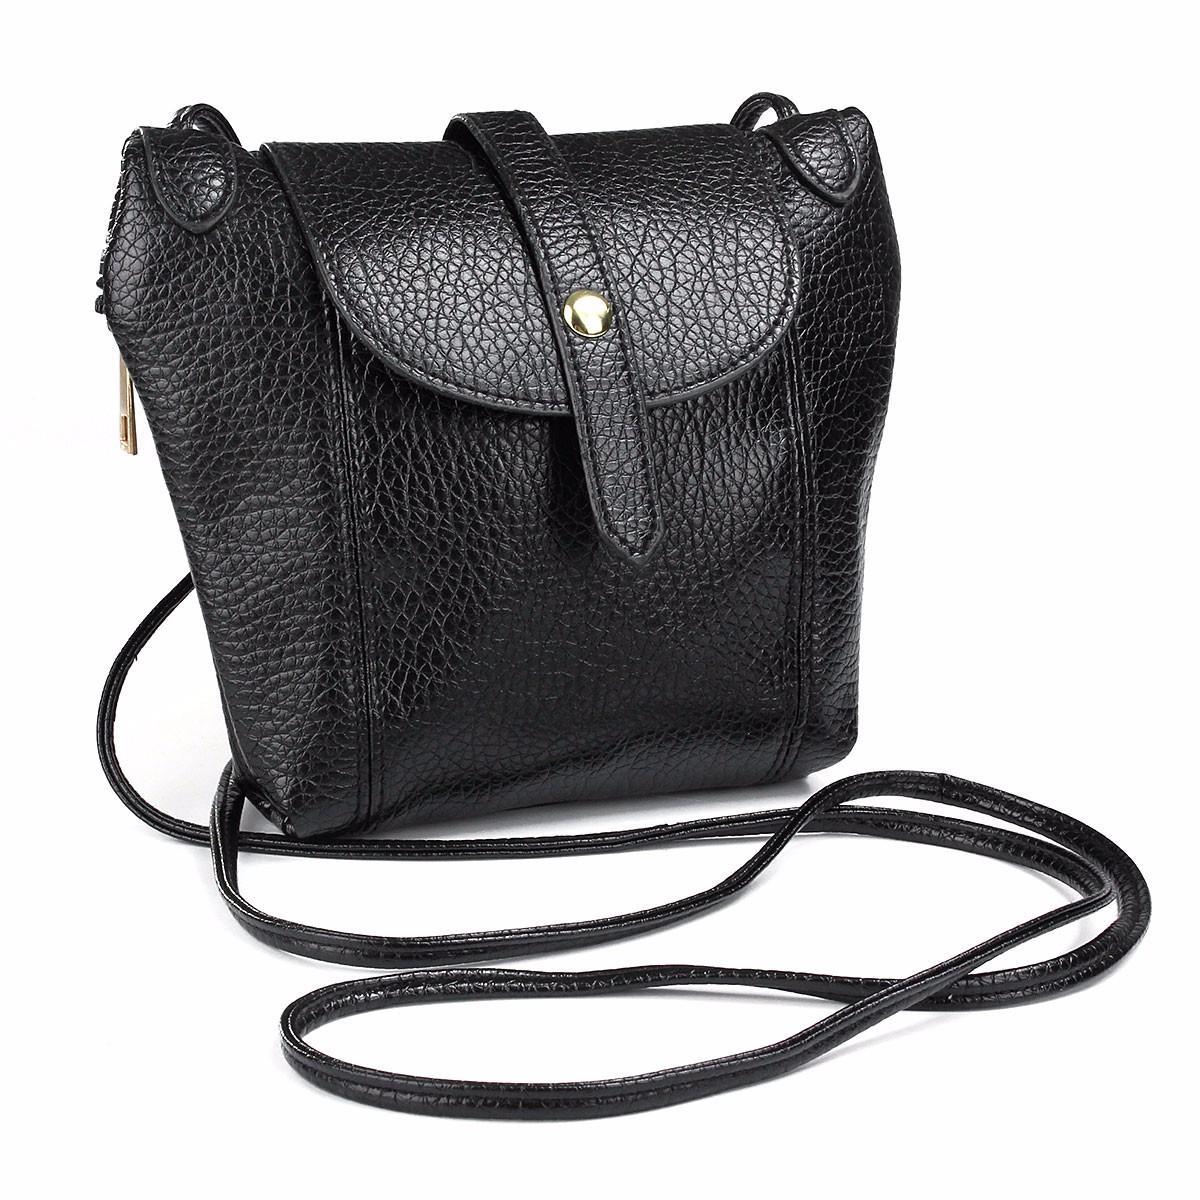 Women Shoulder Mini Bag Pu Washing Leather Crossbody Bags Small Messenger Single Flap Casual Fashion Style Girls Bolsa Feminia(China (Mainland))